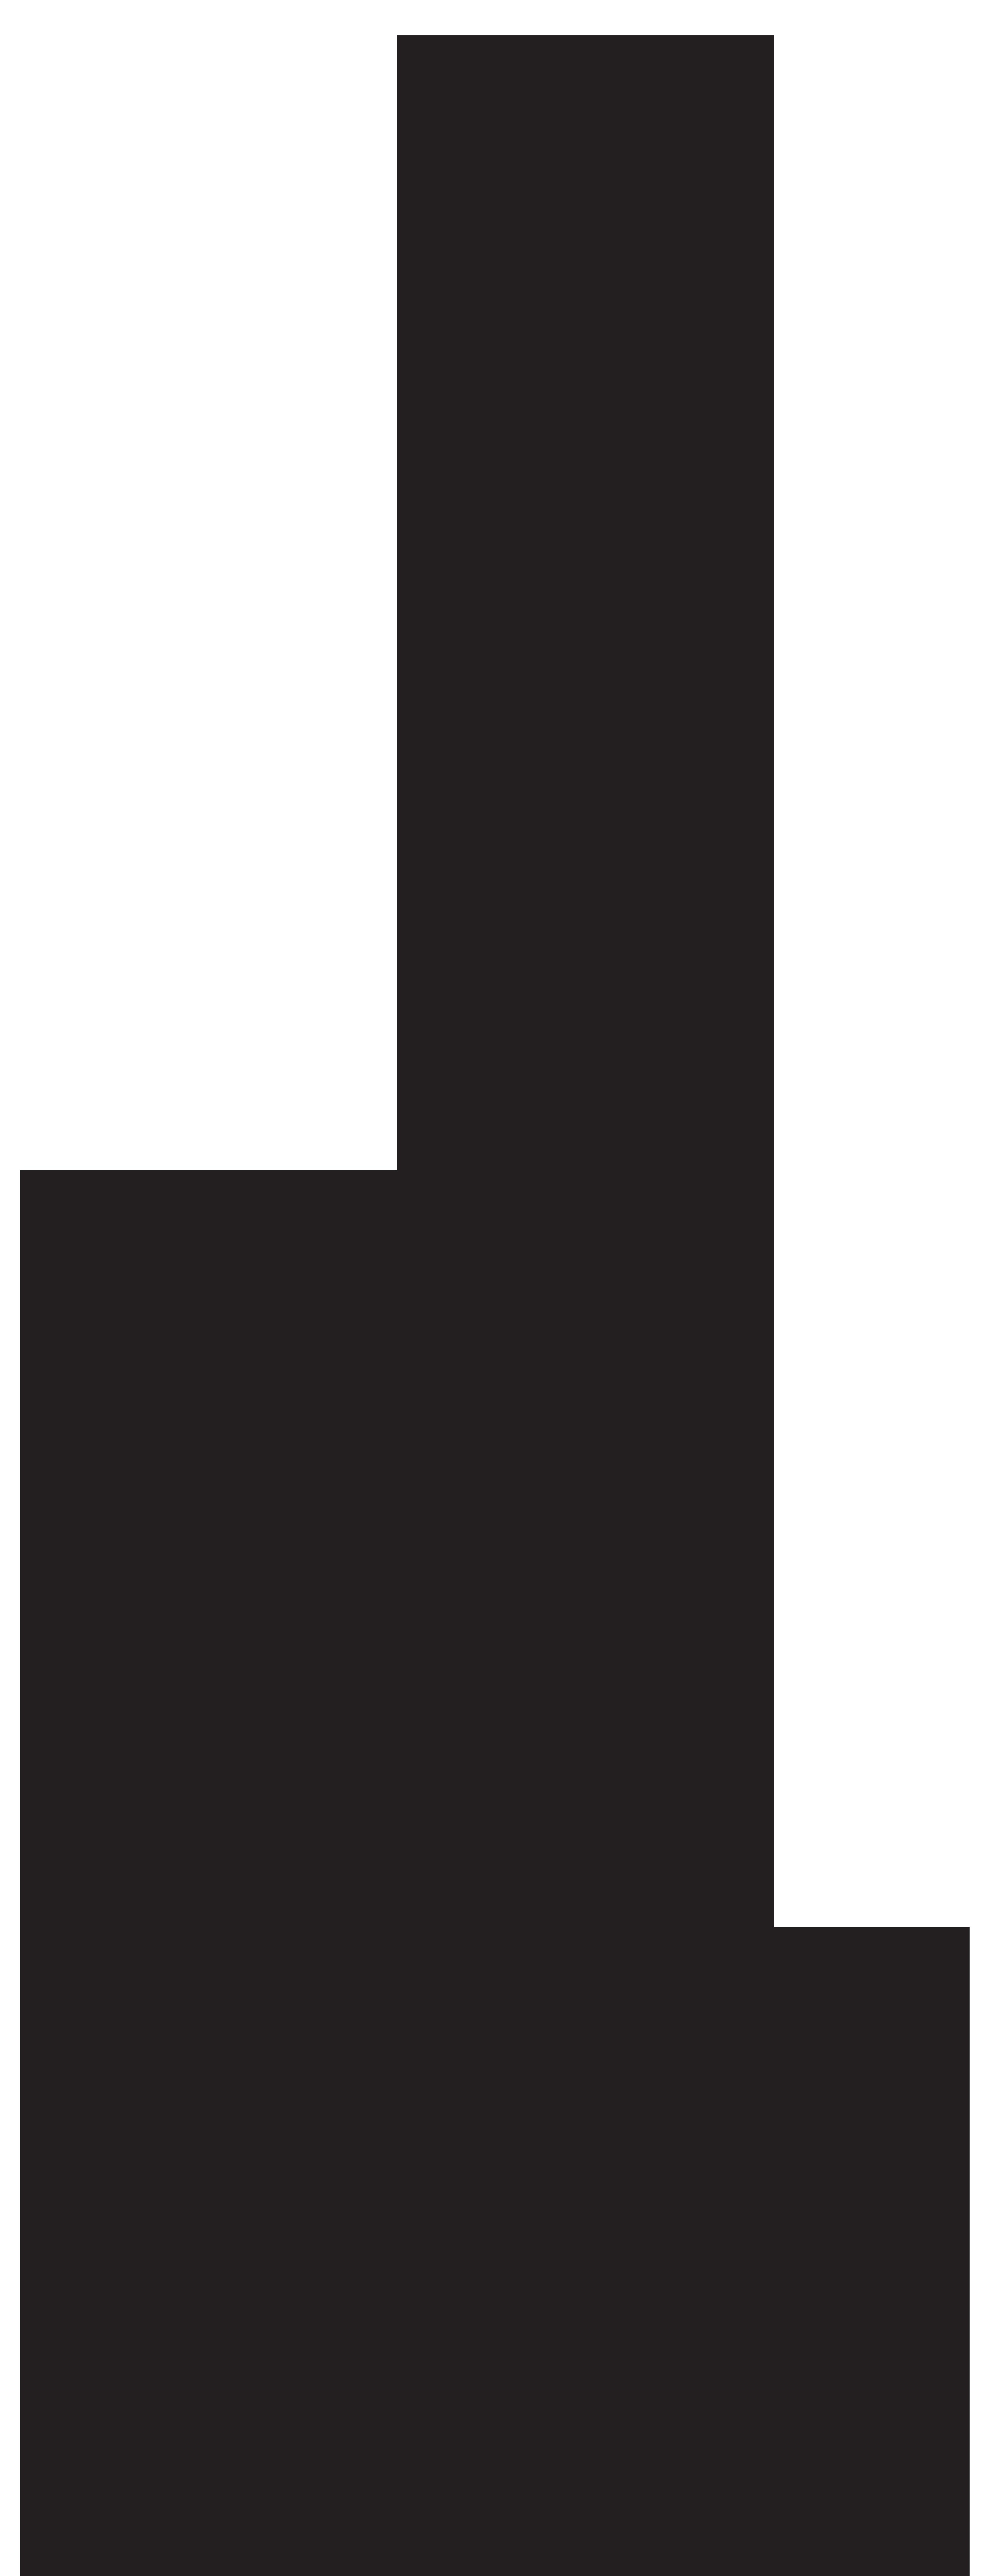 Tower clipart towers telecom. Clip art gray eiffel